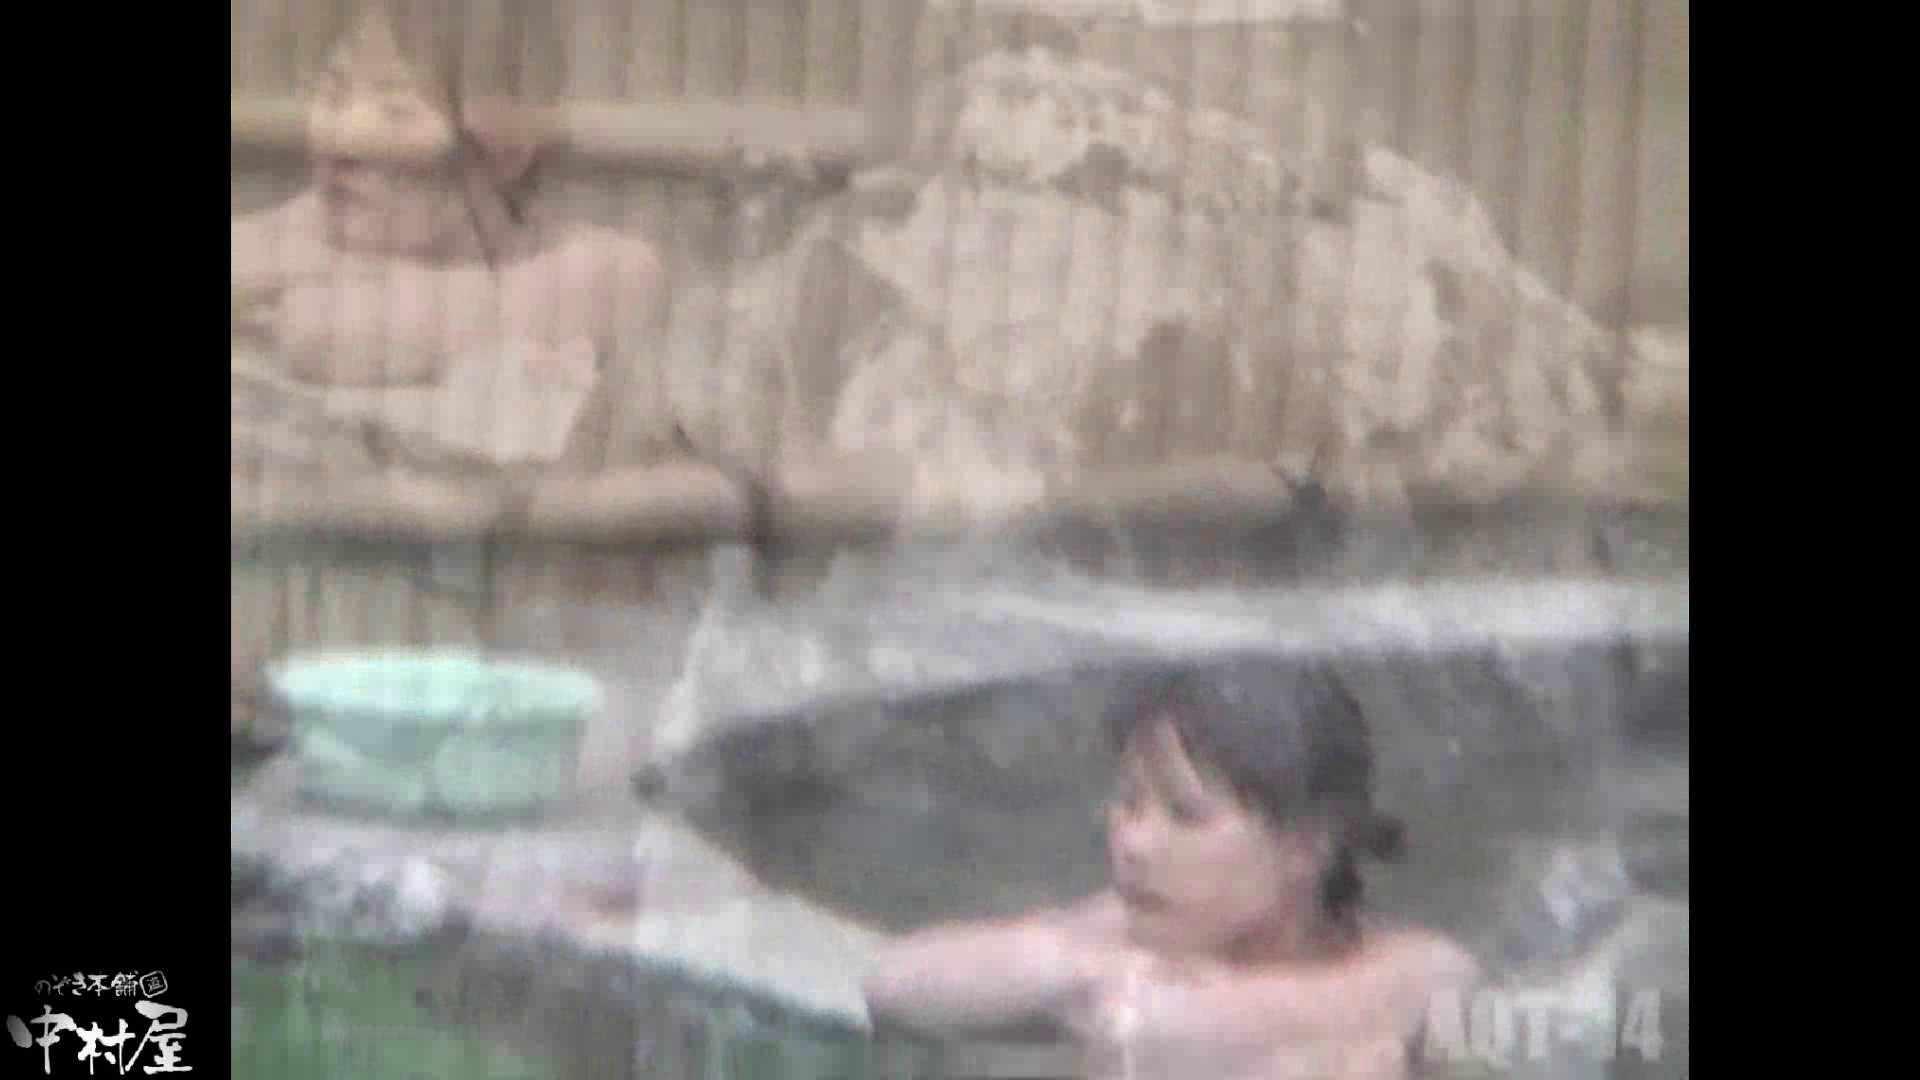 Aquaな露天風呂Vol.878潜入盗撮露天風呂十四判湯 其の三 潜入 | OLセックス  110画像 17